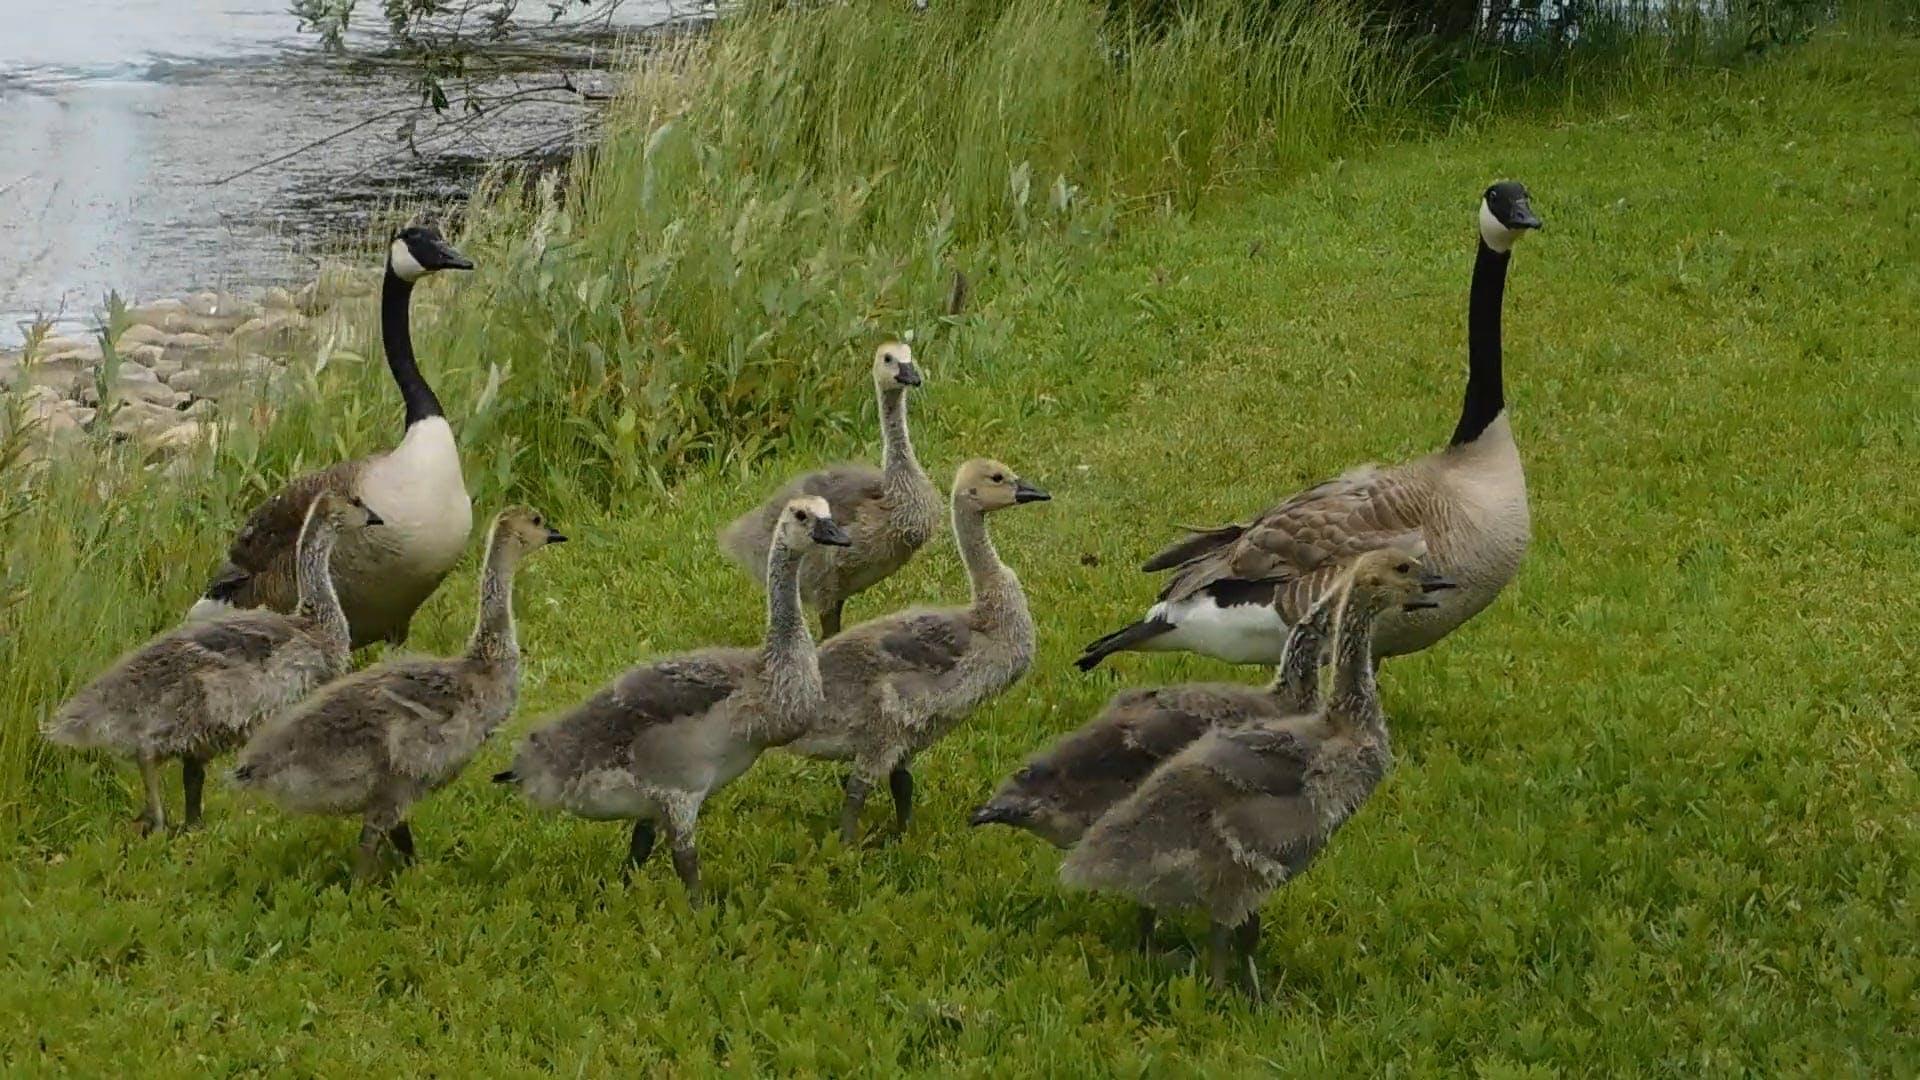 Ducks Walking On Grass